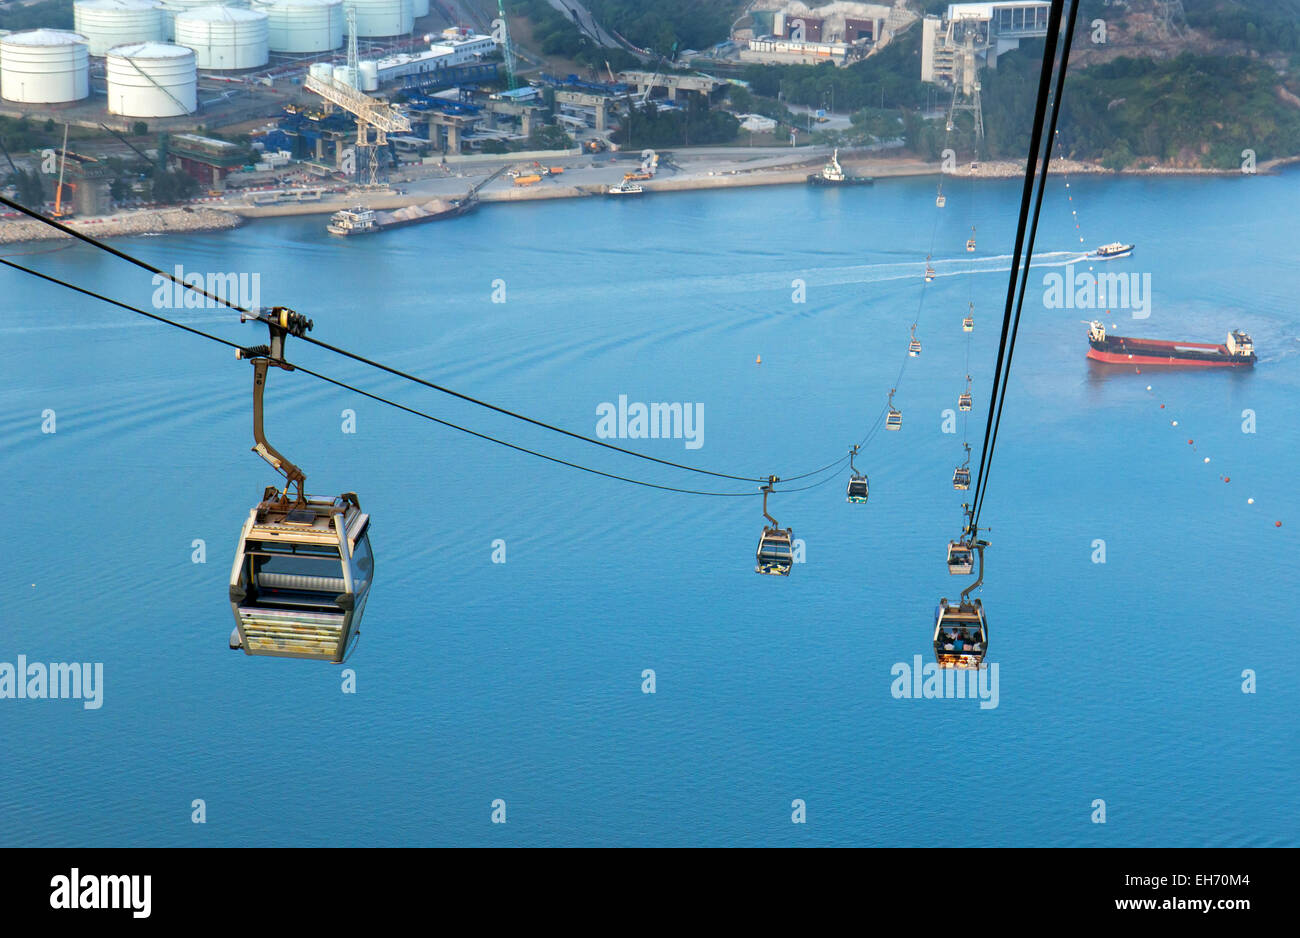 cableway to the island Lantau - Stock Image